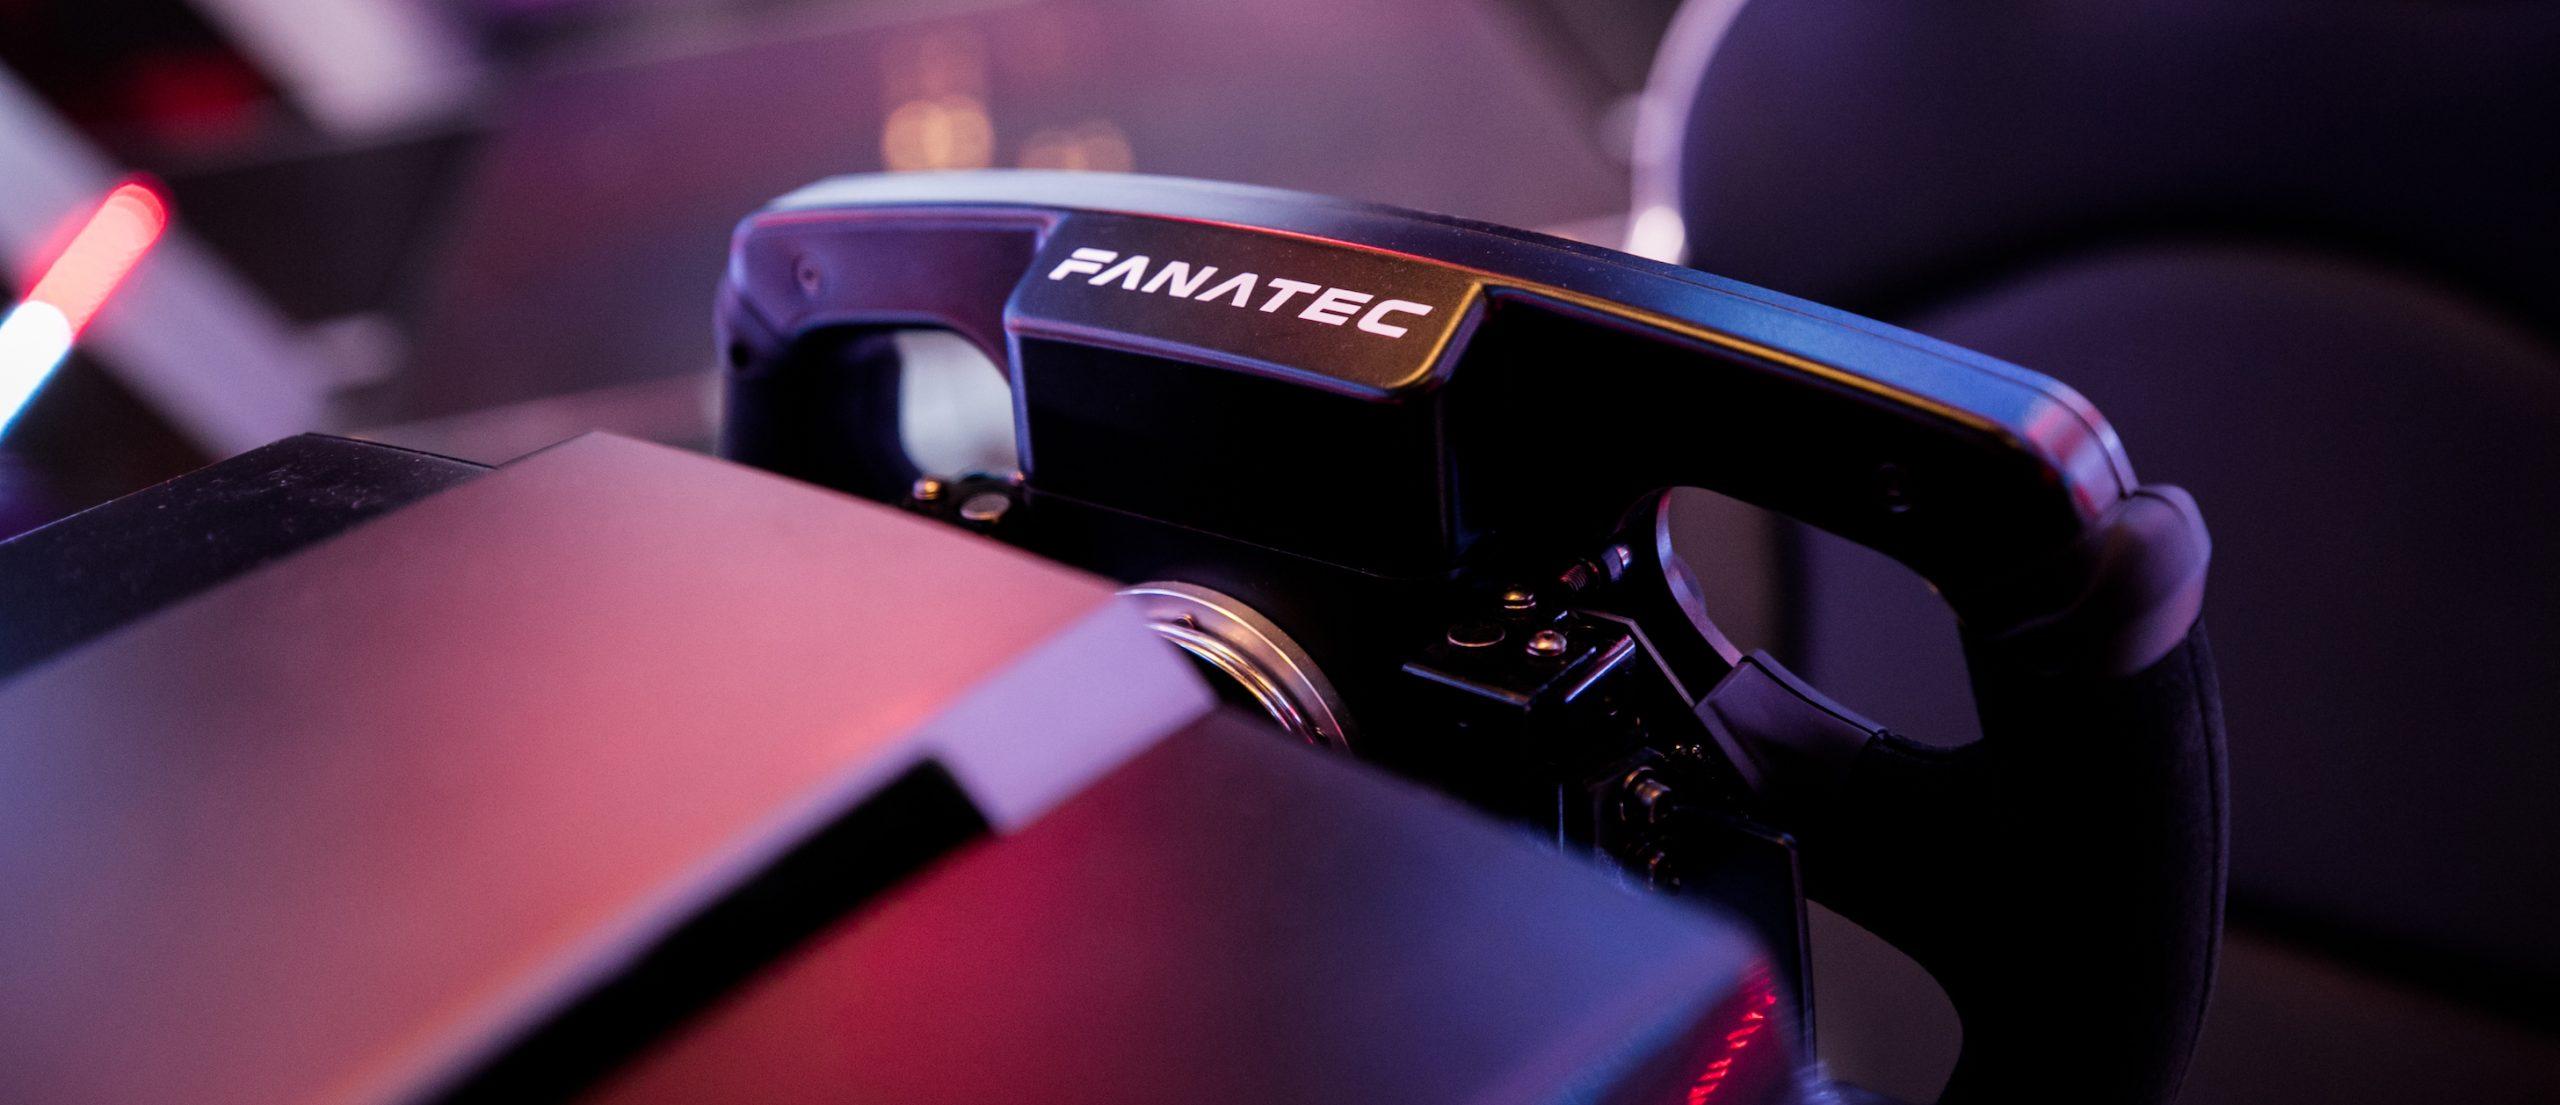 Win the ULTIMATE Fanatec Racing Bundle!